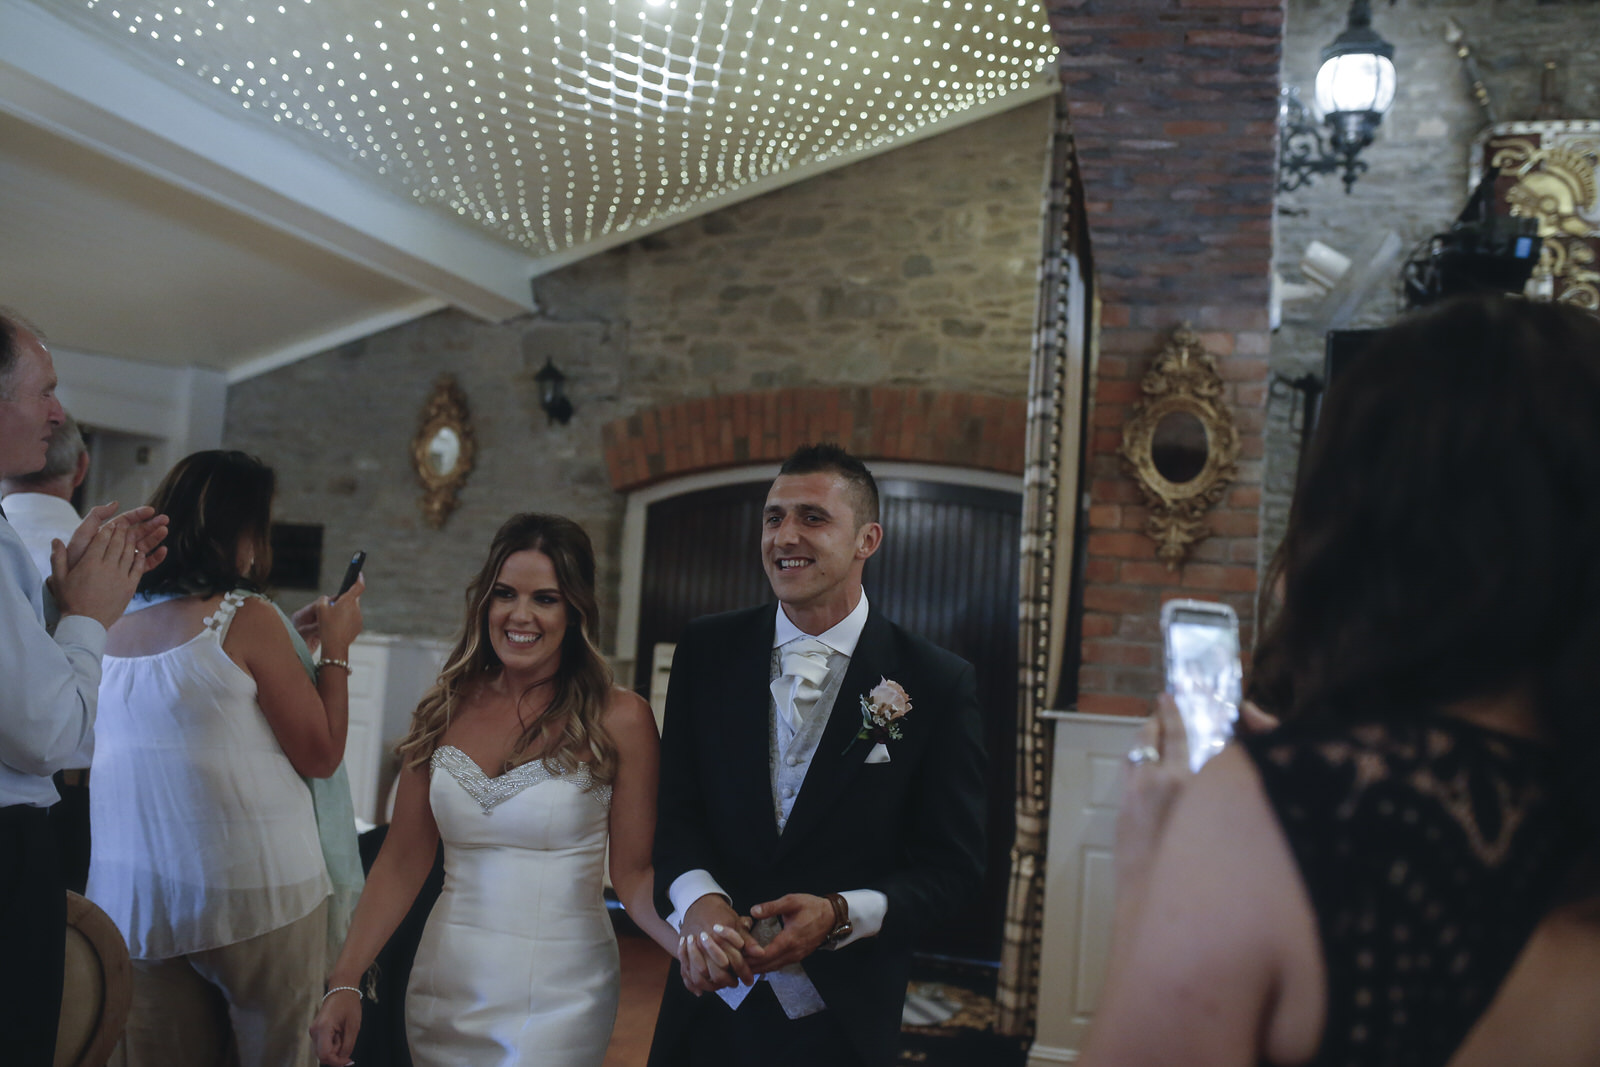 darver_castle_wedding_photographer_goldenmonentsweddingphotography_a274.jpg